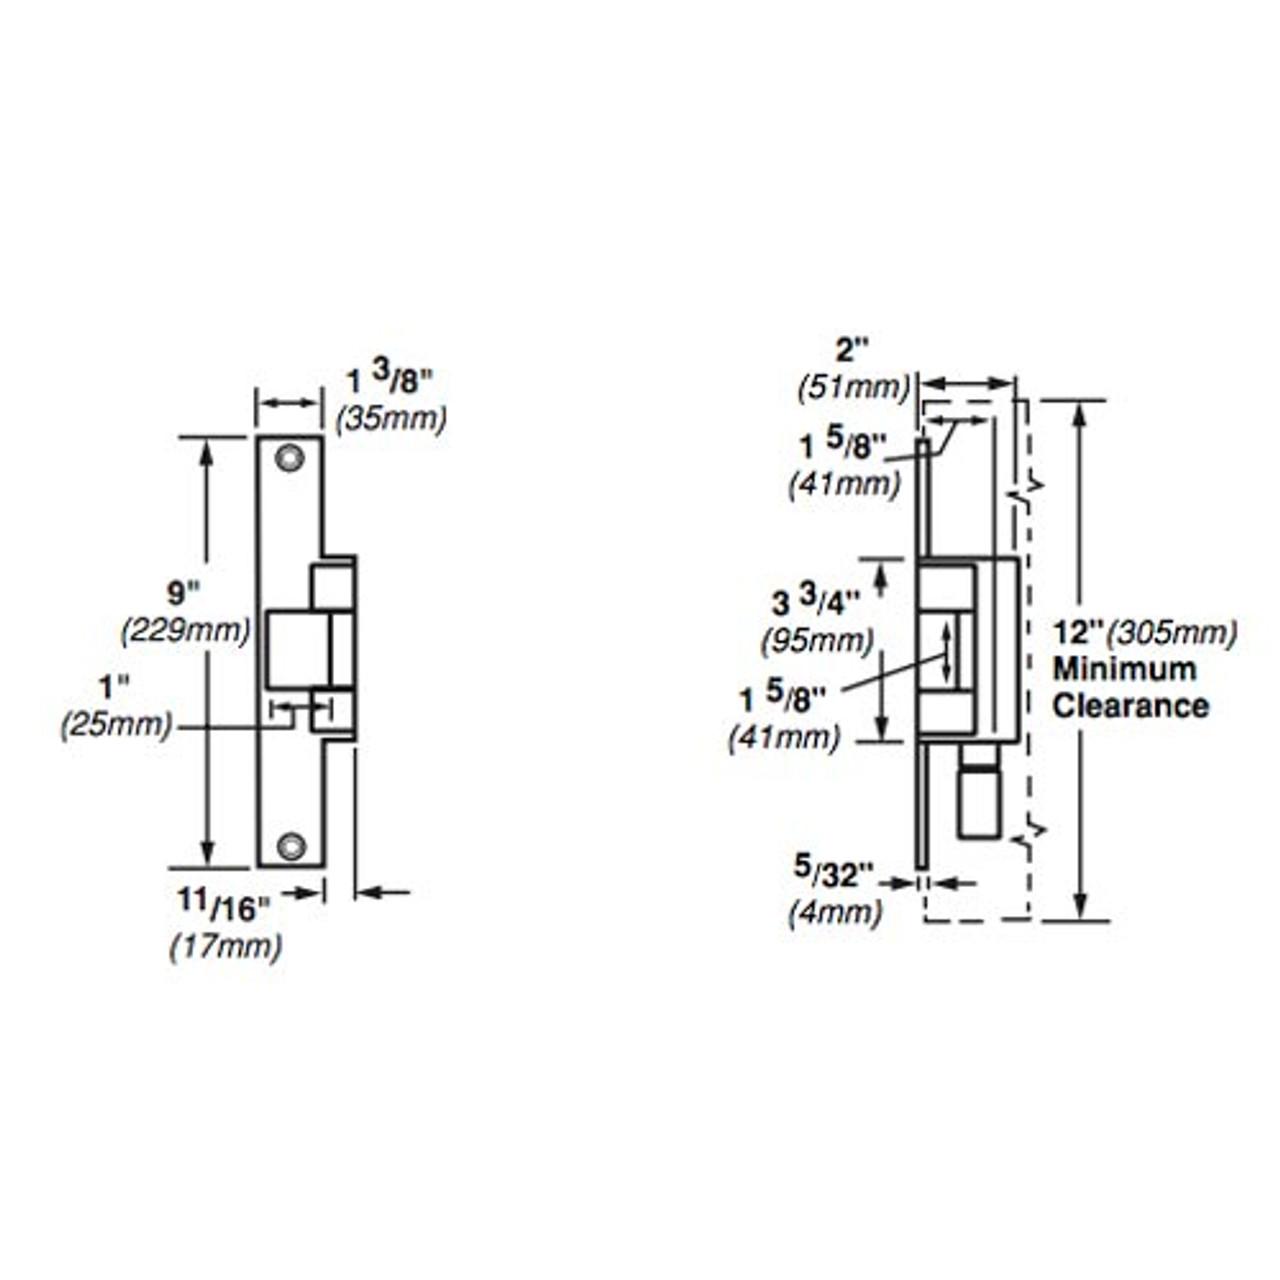 6214-12VDC-US4 Von Duprin Electric Strike for Mortise or Cylindrical Locksets in Satin Brass Finish